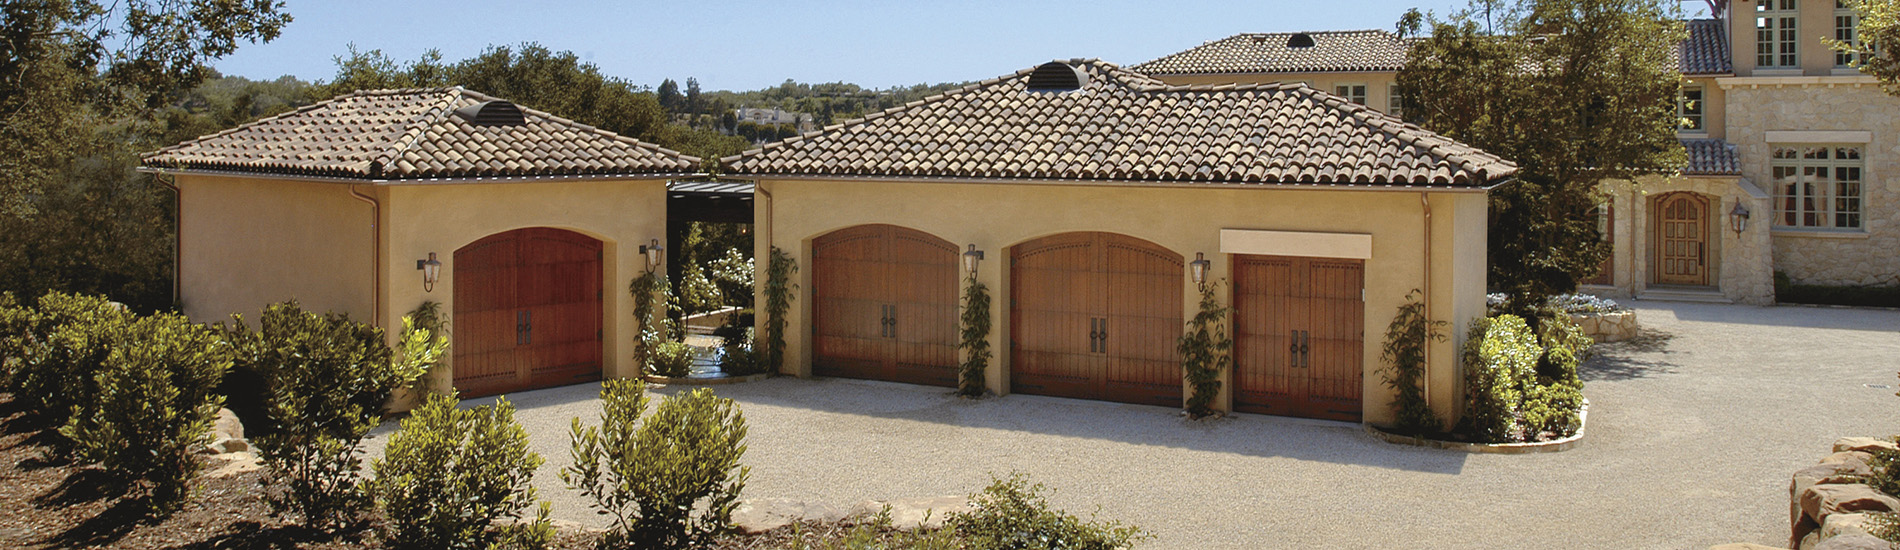 Garage Door Repair In Palm Springs Area Precision